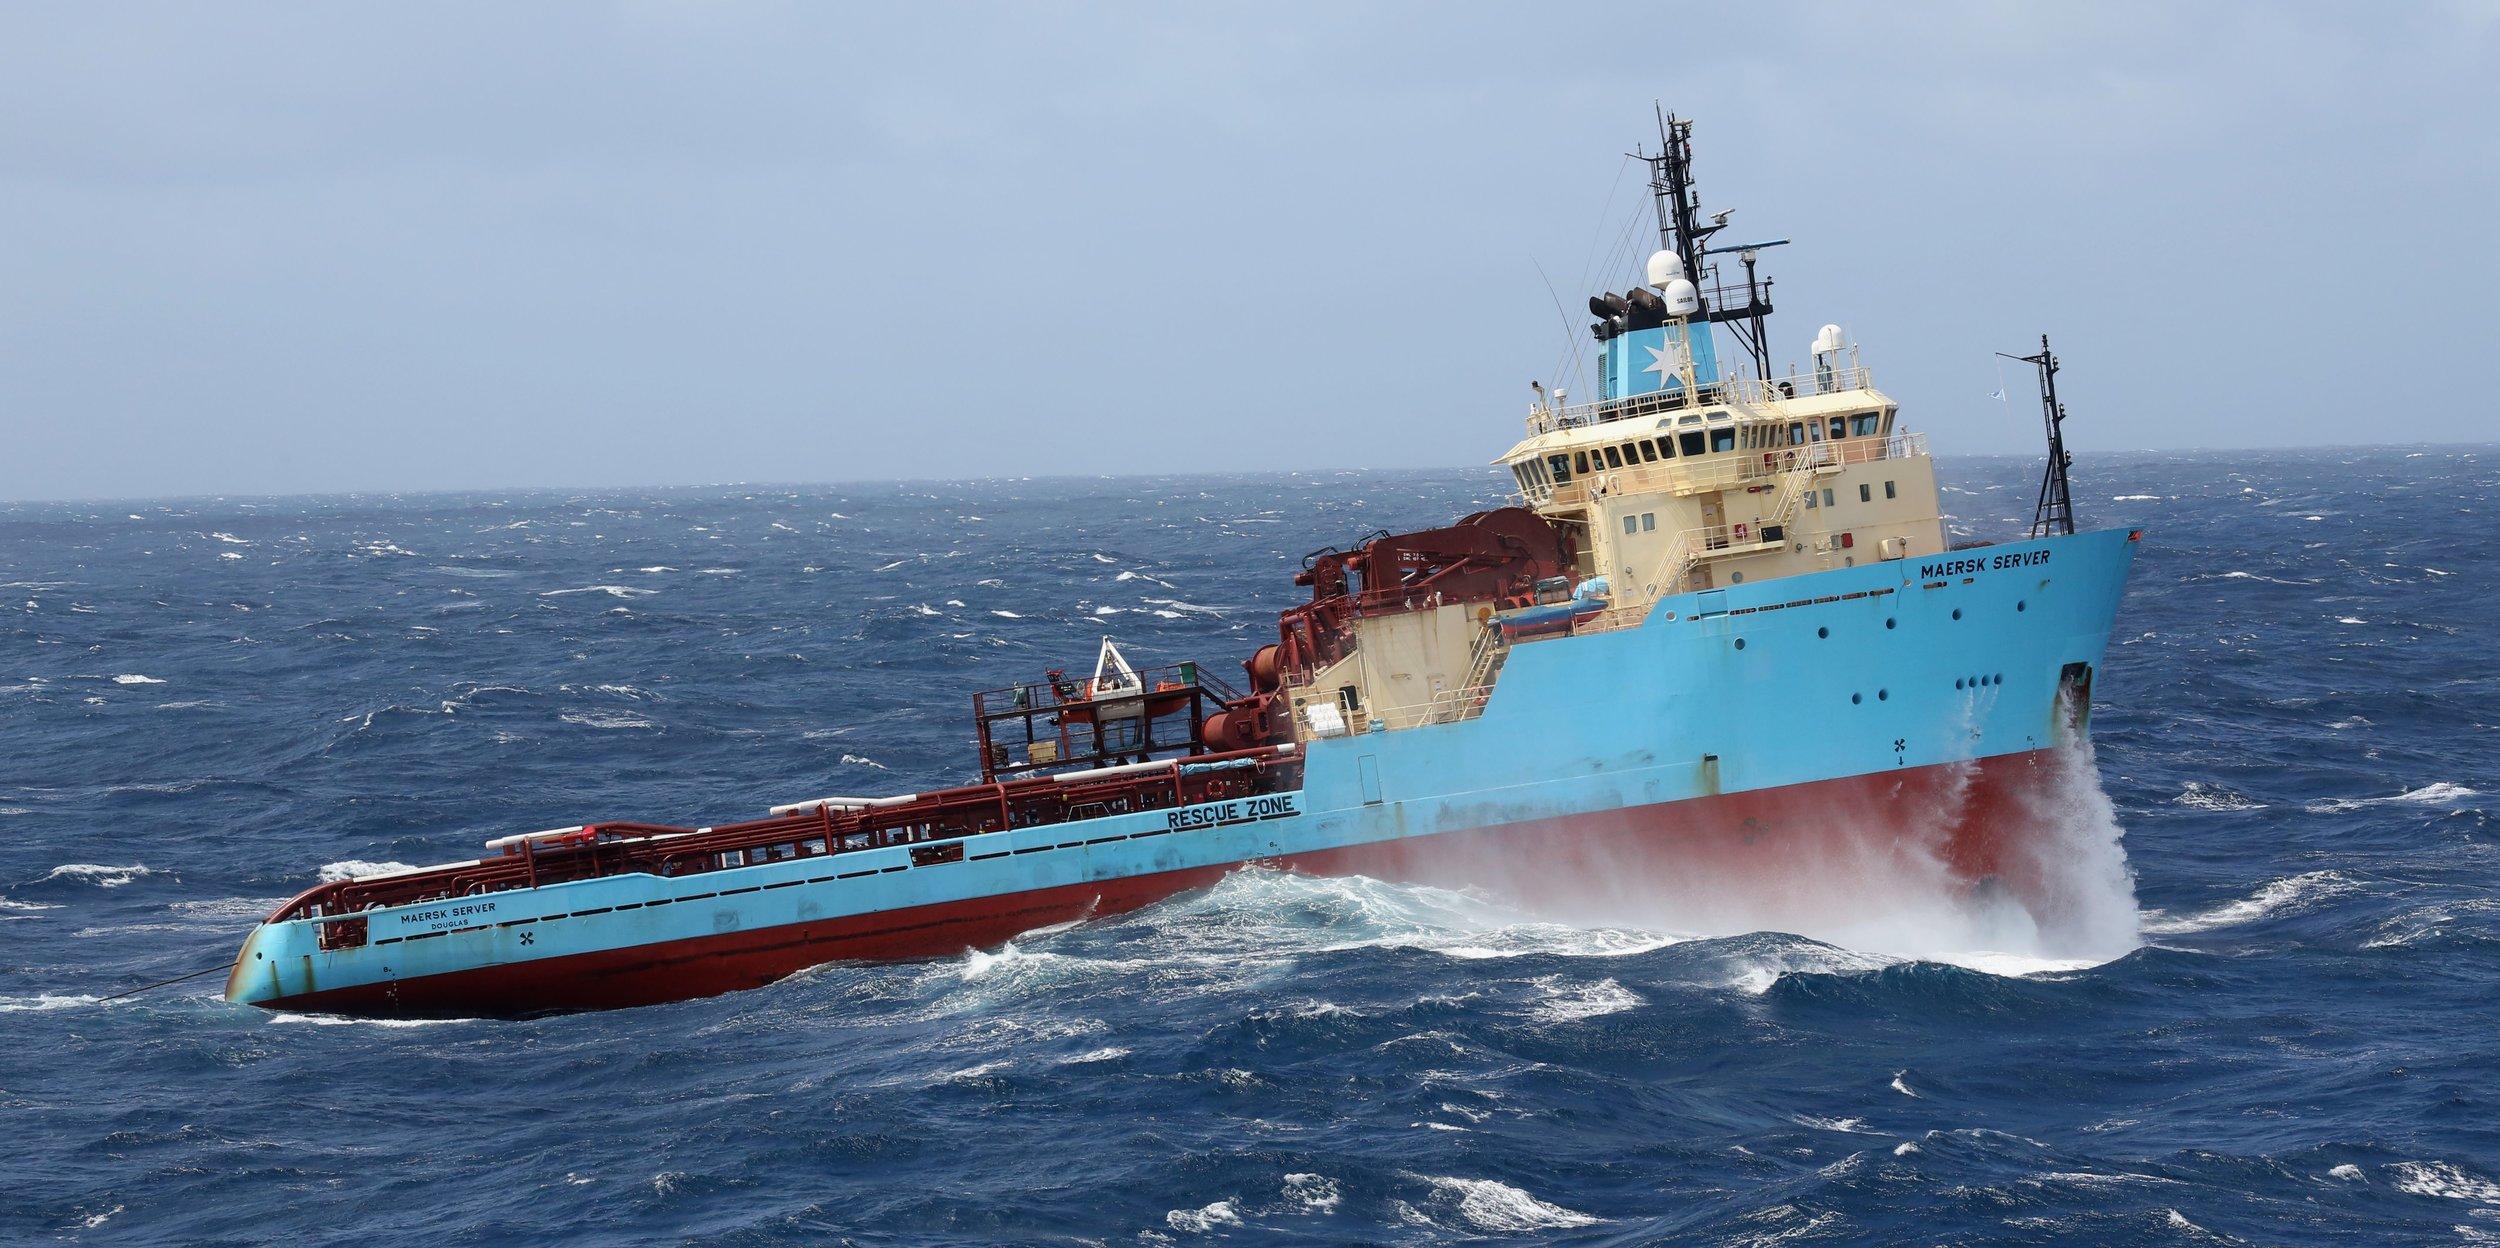 Skibslister og dansk søulykke statistik -